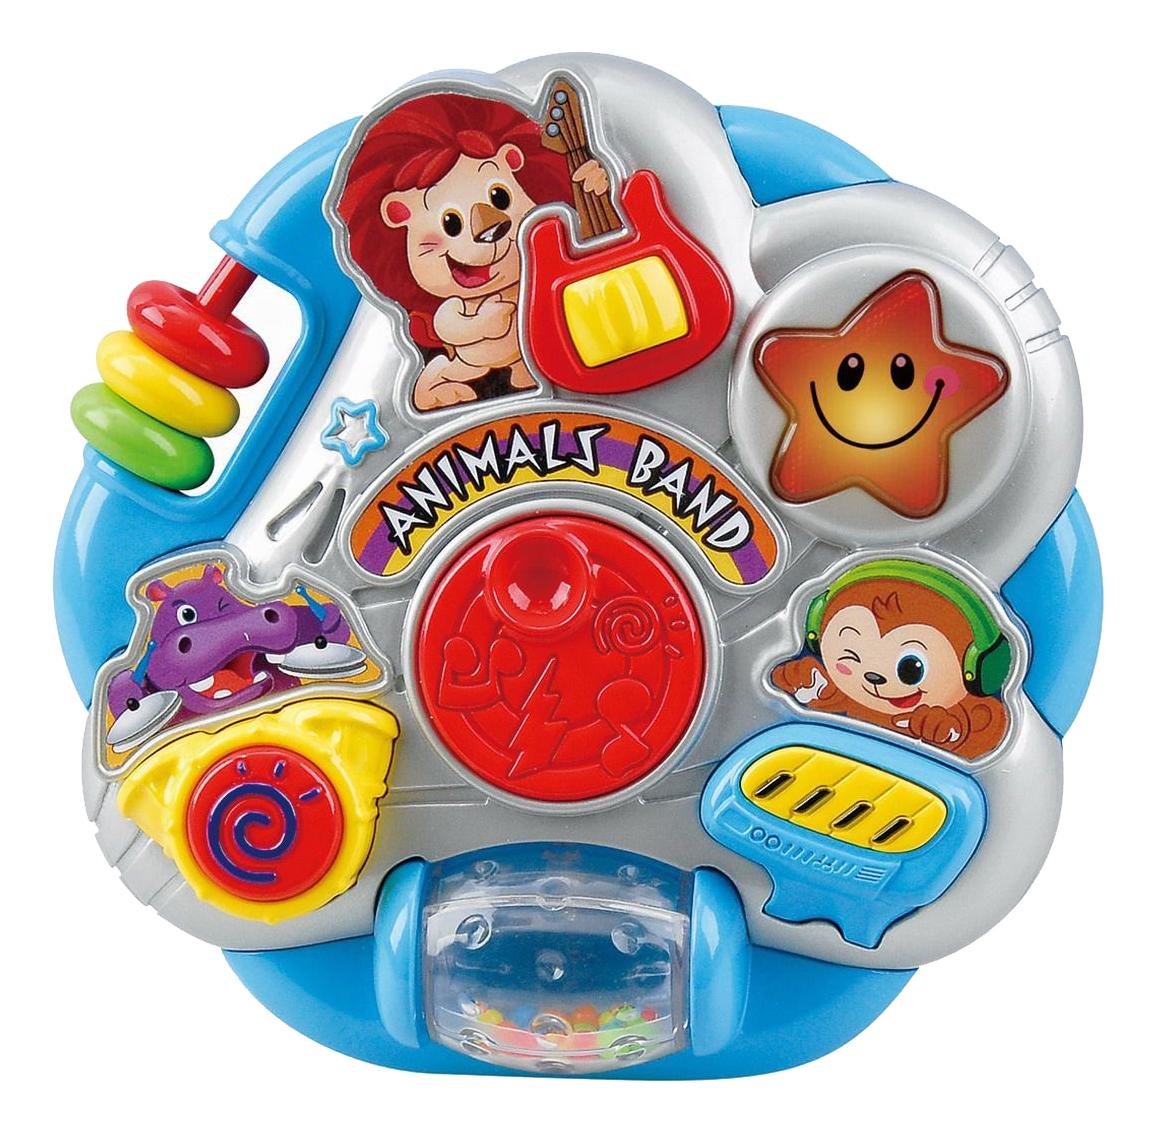 картинка Развивающая игрушка Playgo Оркестр с животными от магазина Bebikam.ru